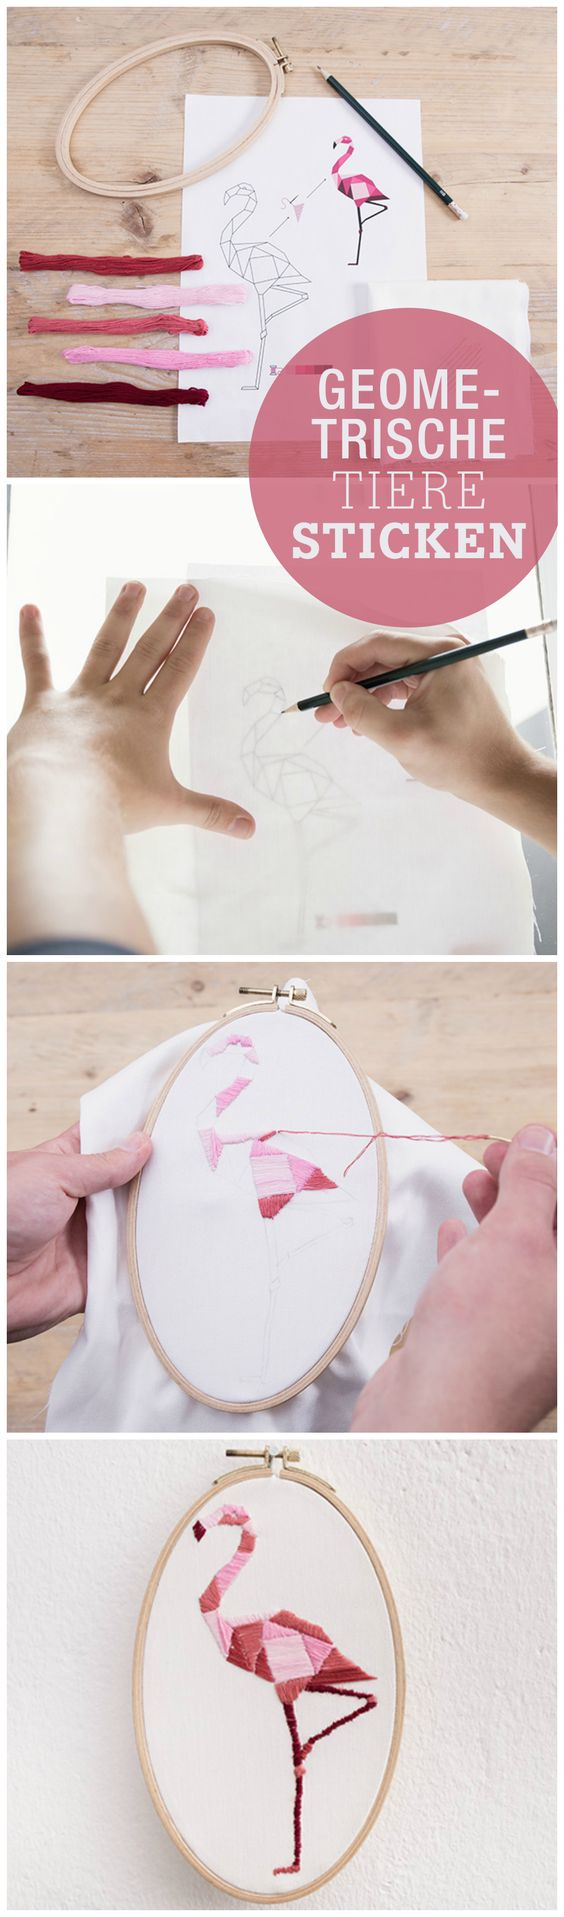 Kostenlose Anleitung: Geometrische Tiere im Stickrahmen, sticken lernen, Flamingo / free diy tutorial: create embroidery animals, geometric, pink flamingo via DaWanda.com